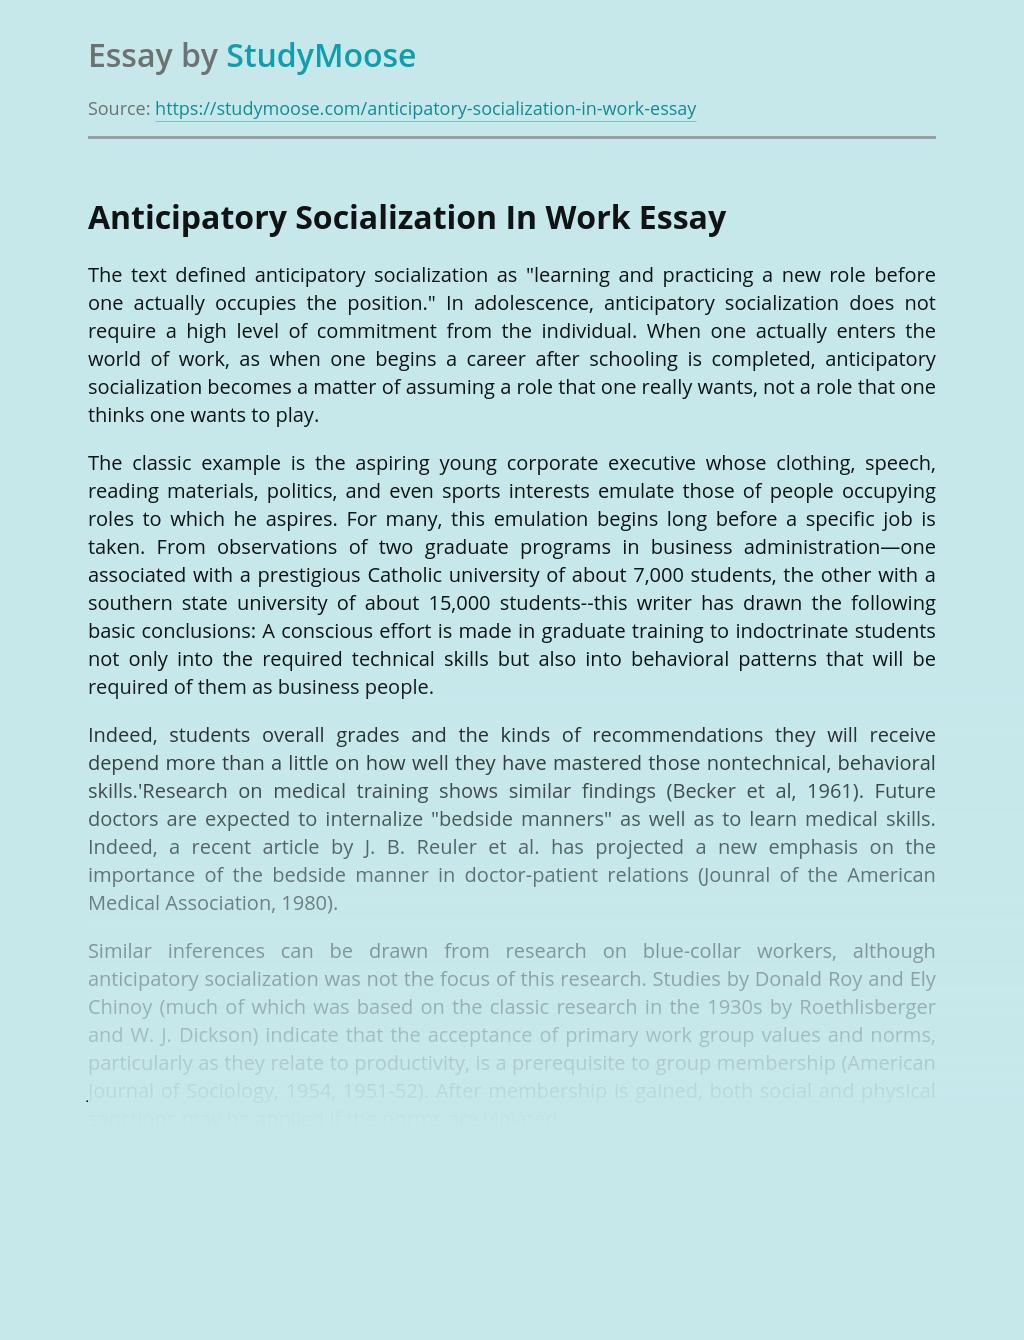 Anticipatory Socialization In Work